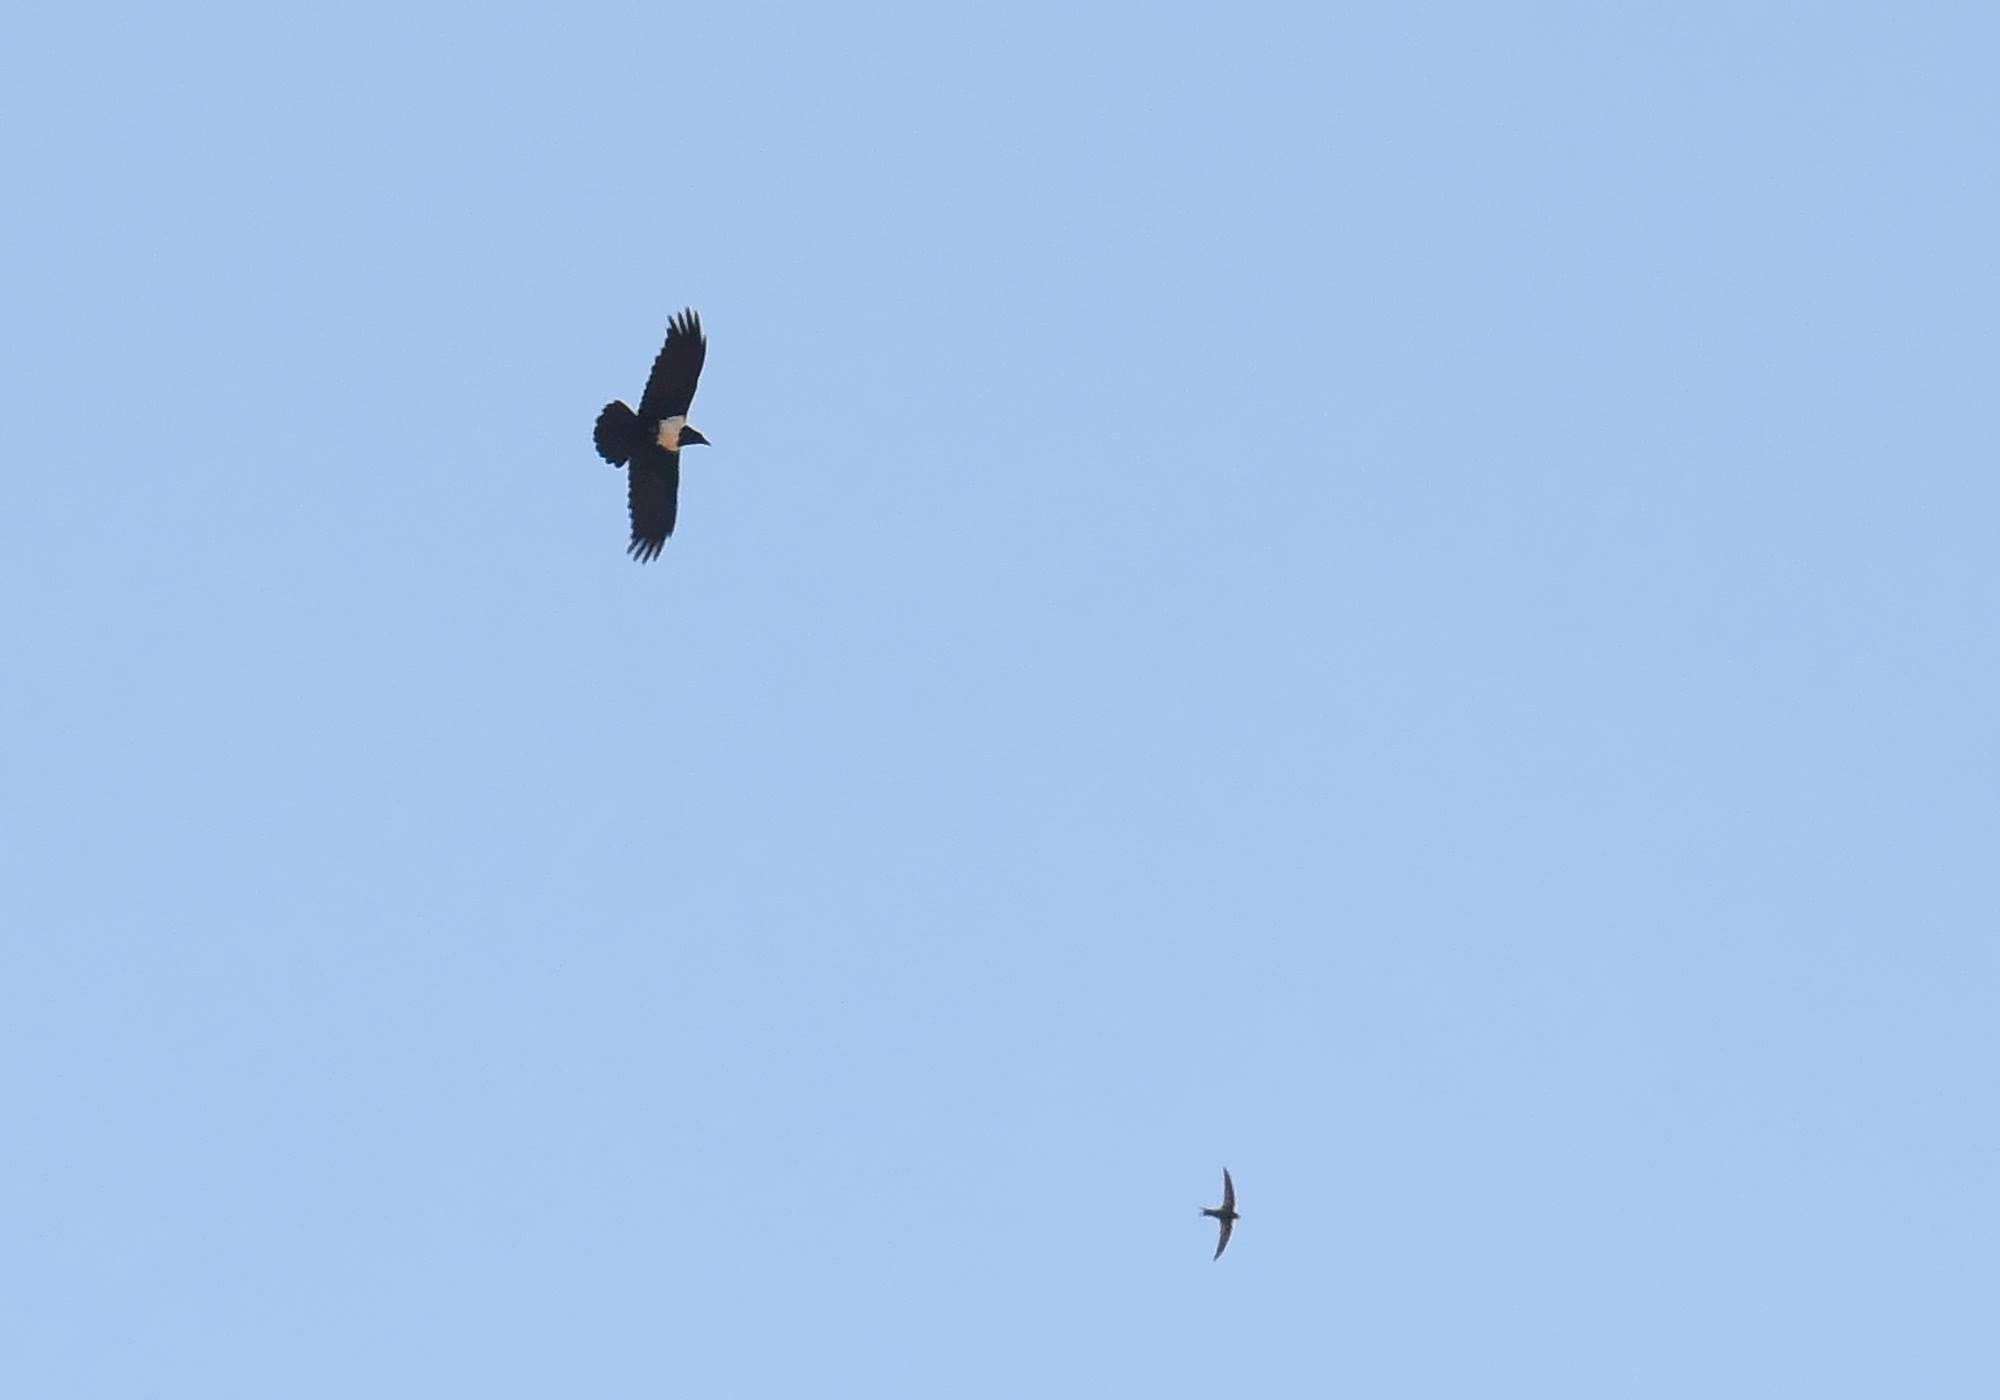 Pied Crow / Corbeau pie (Corvus albus), Oum Azza, near Rabat, 1 May 2017 (Petteri Lehikoinen)